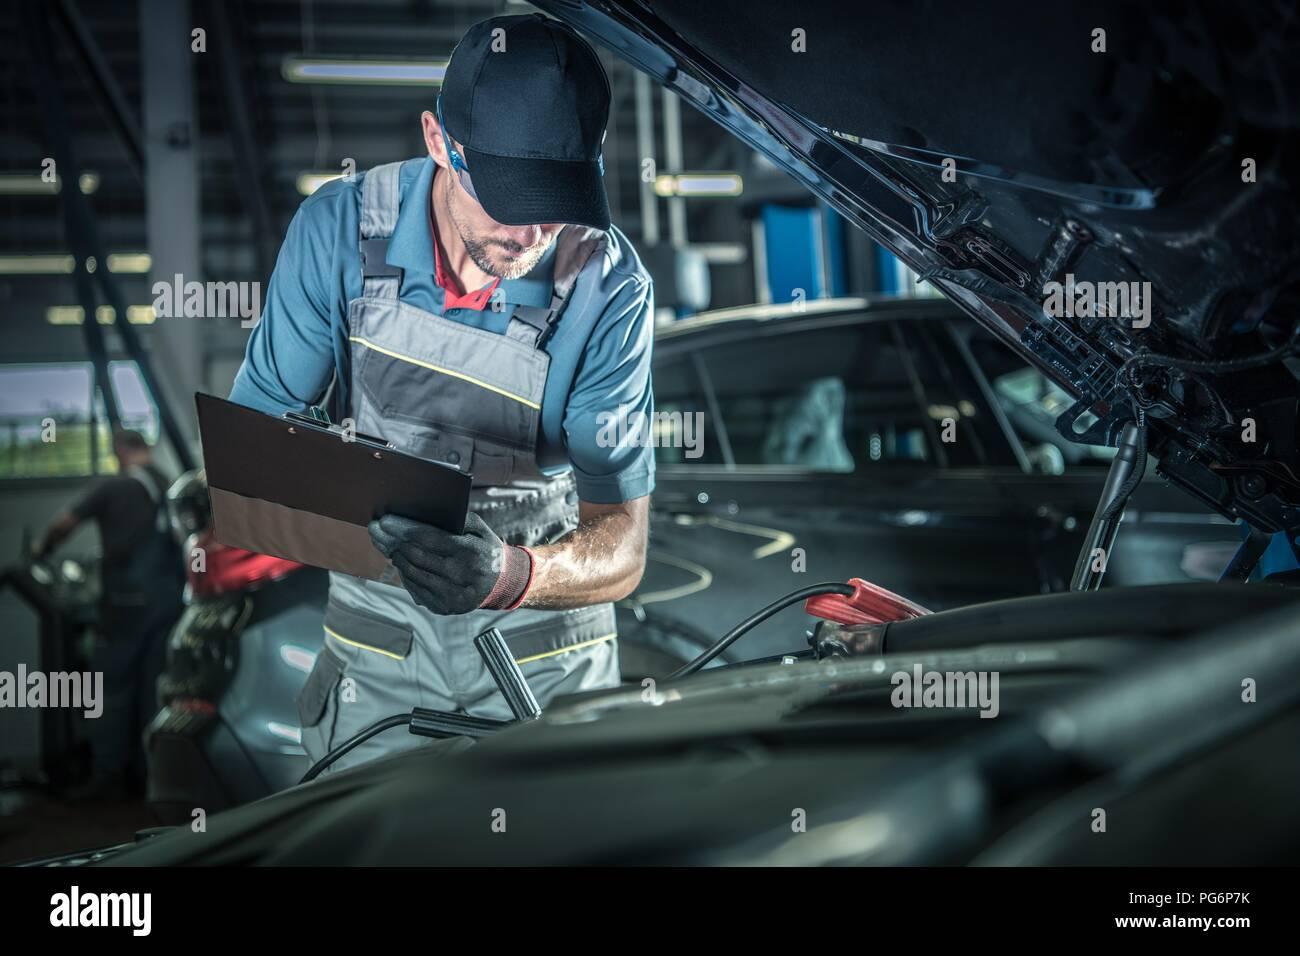 Automechaniker detaillierte Überprüfung des Fahrzeugs. Auto Service Center Thema. Stockbild